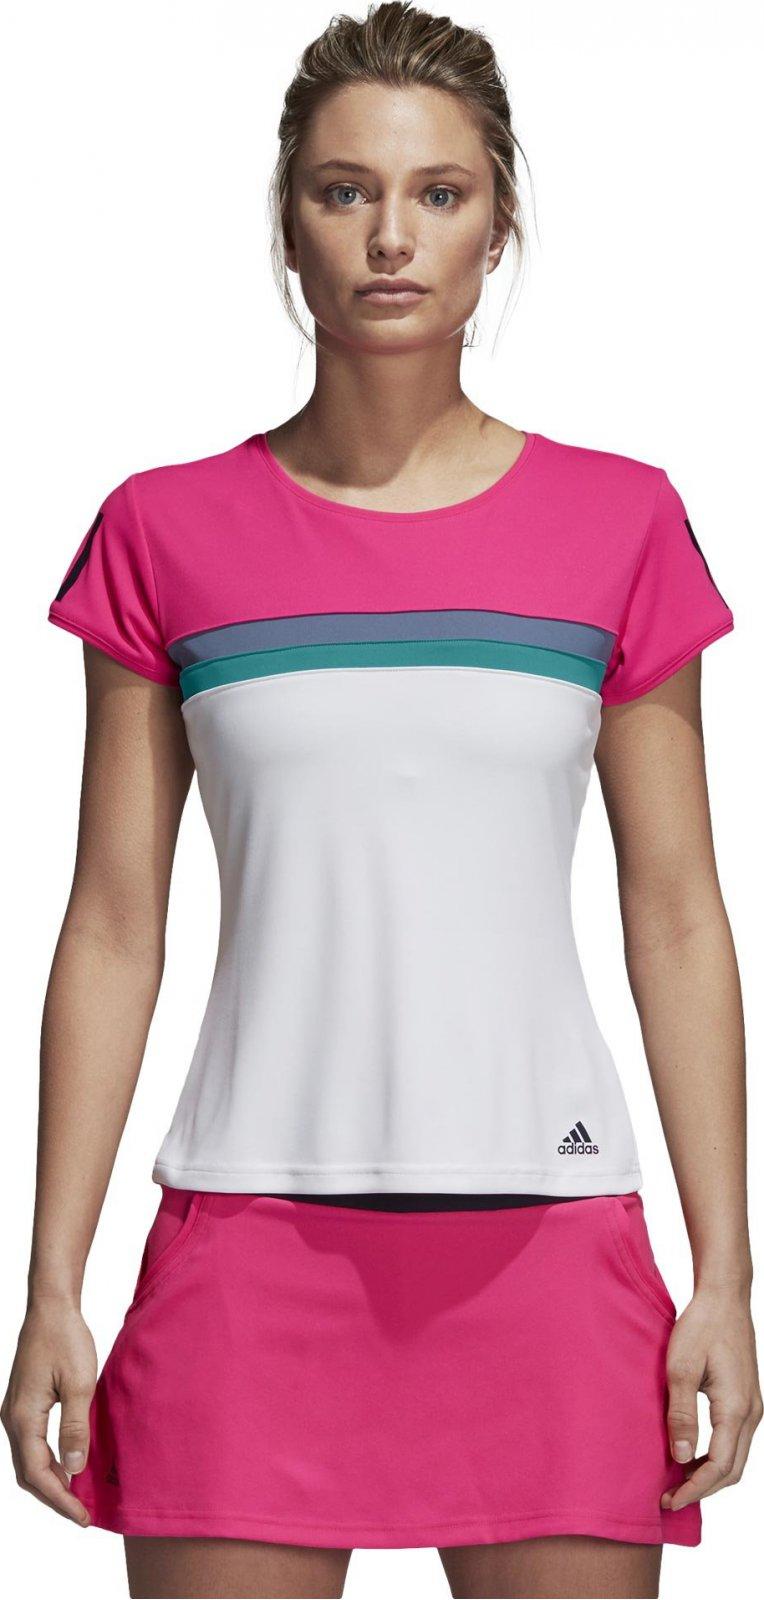 Adidas Club dámské tenisové tričko růžové od 590 Kč • Zboží.cz 577b6af2f53